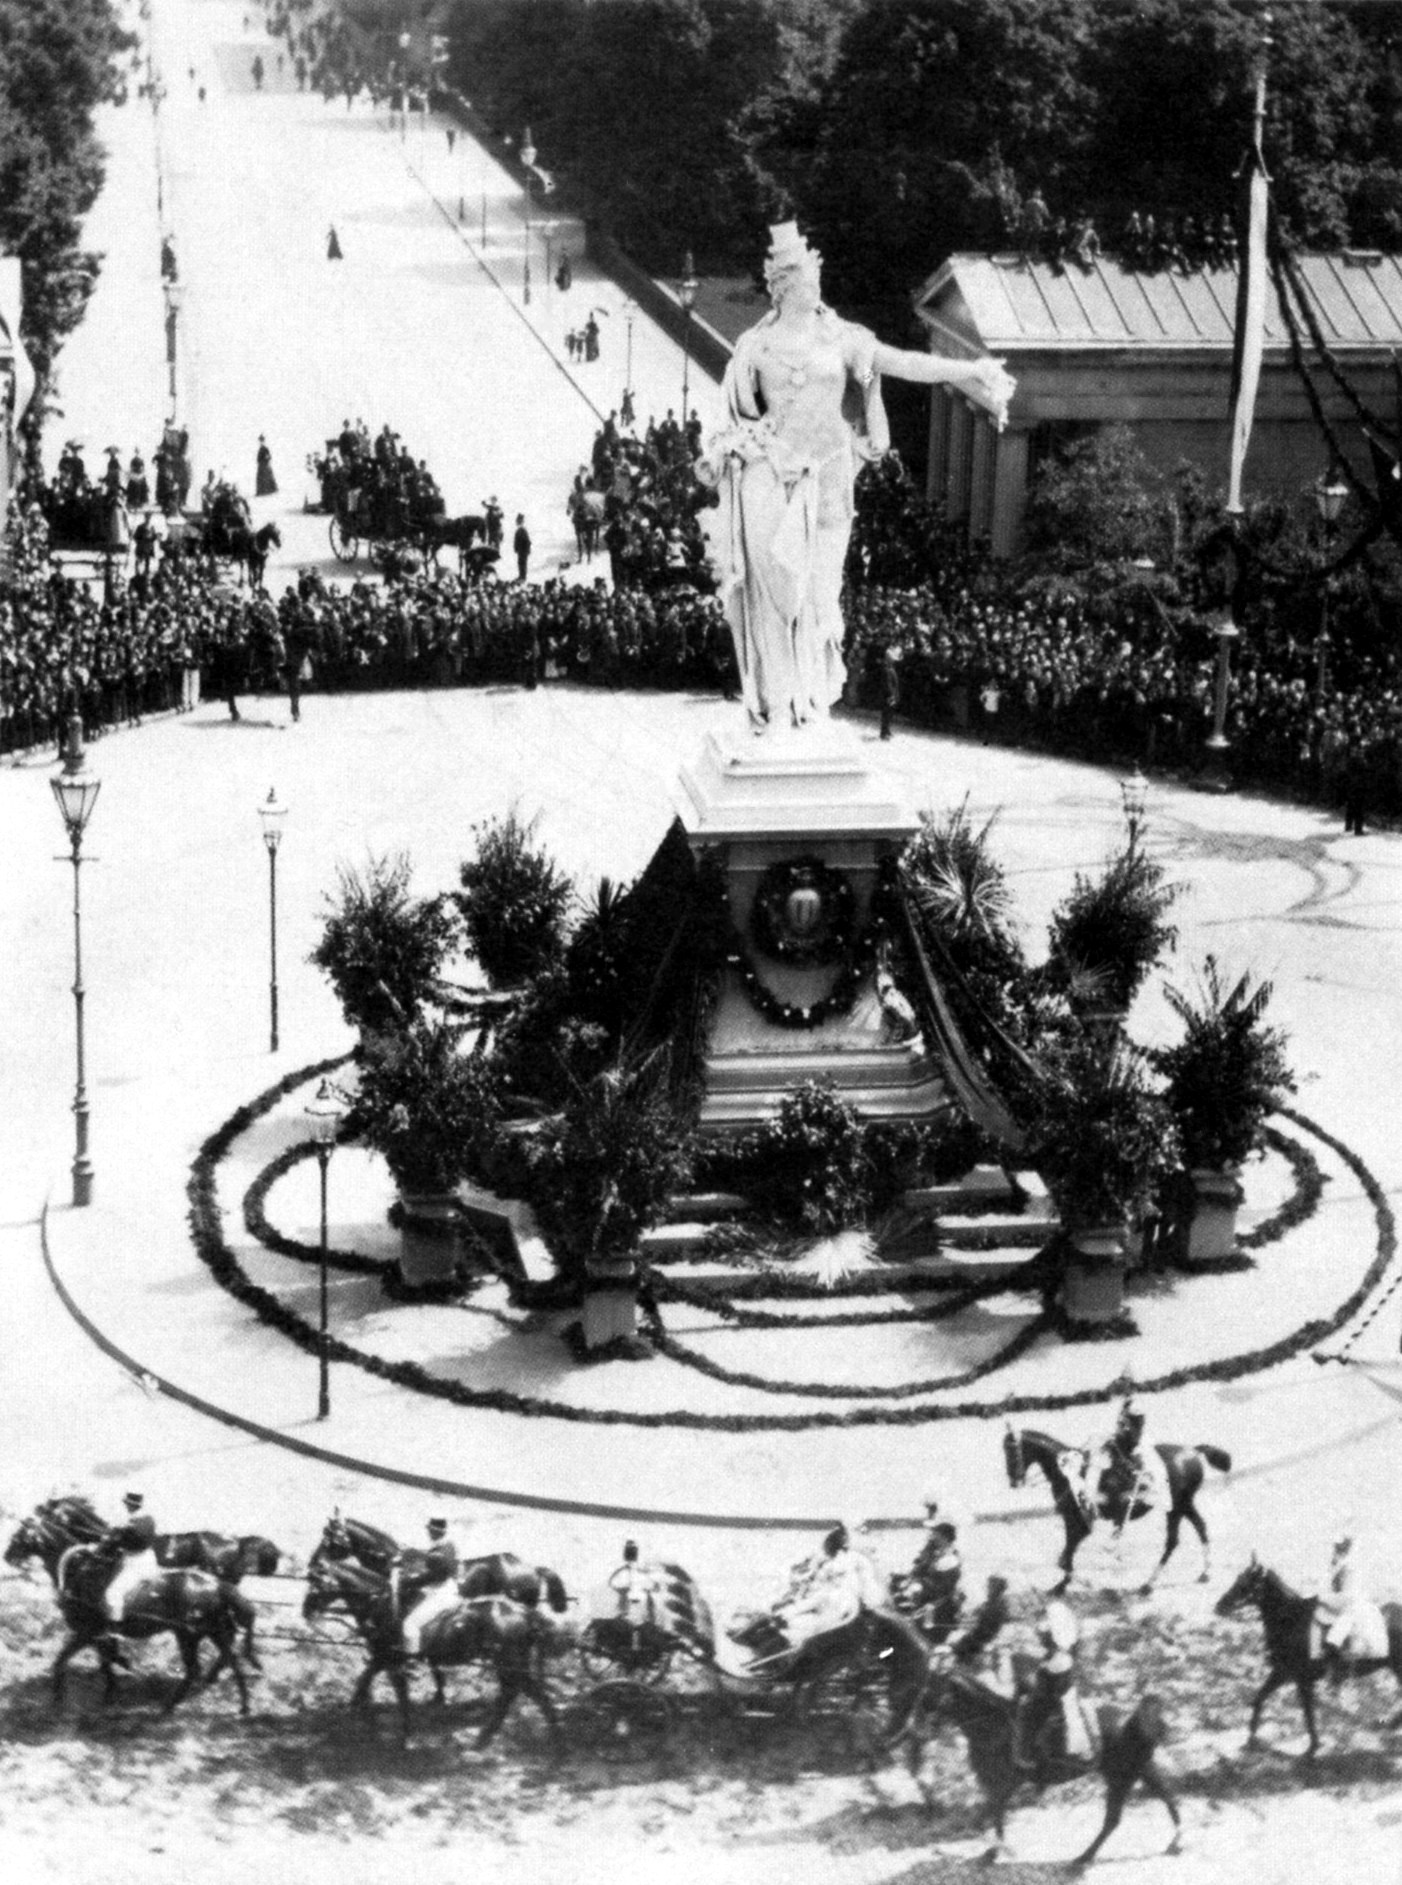 Berolina – 1889 – Auf dem Potsdamer Platz